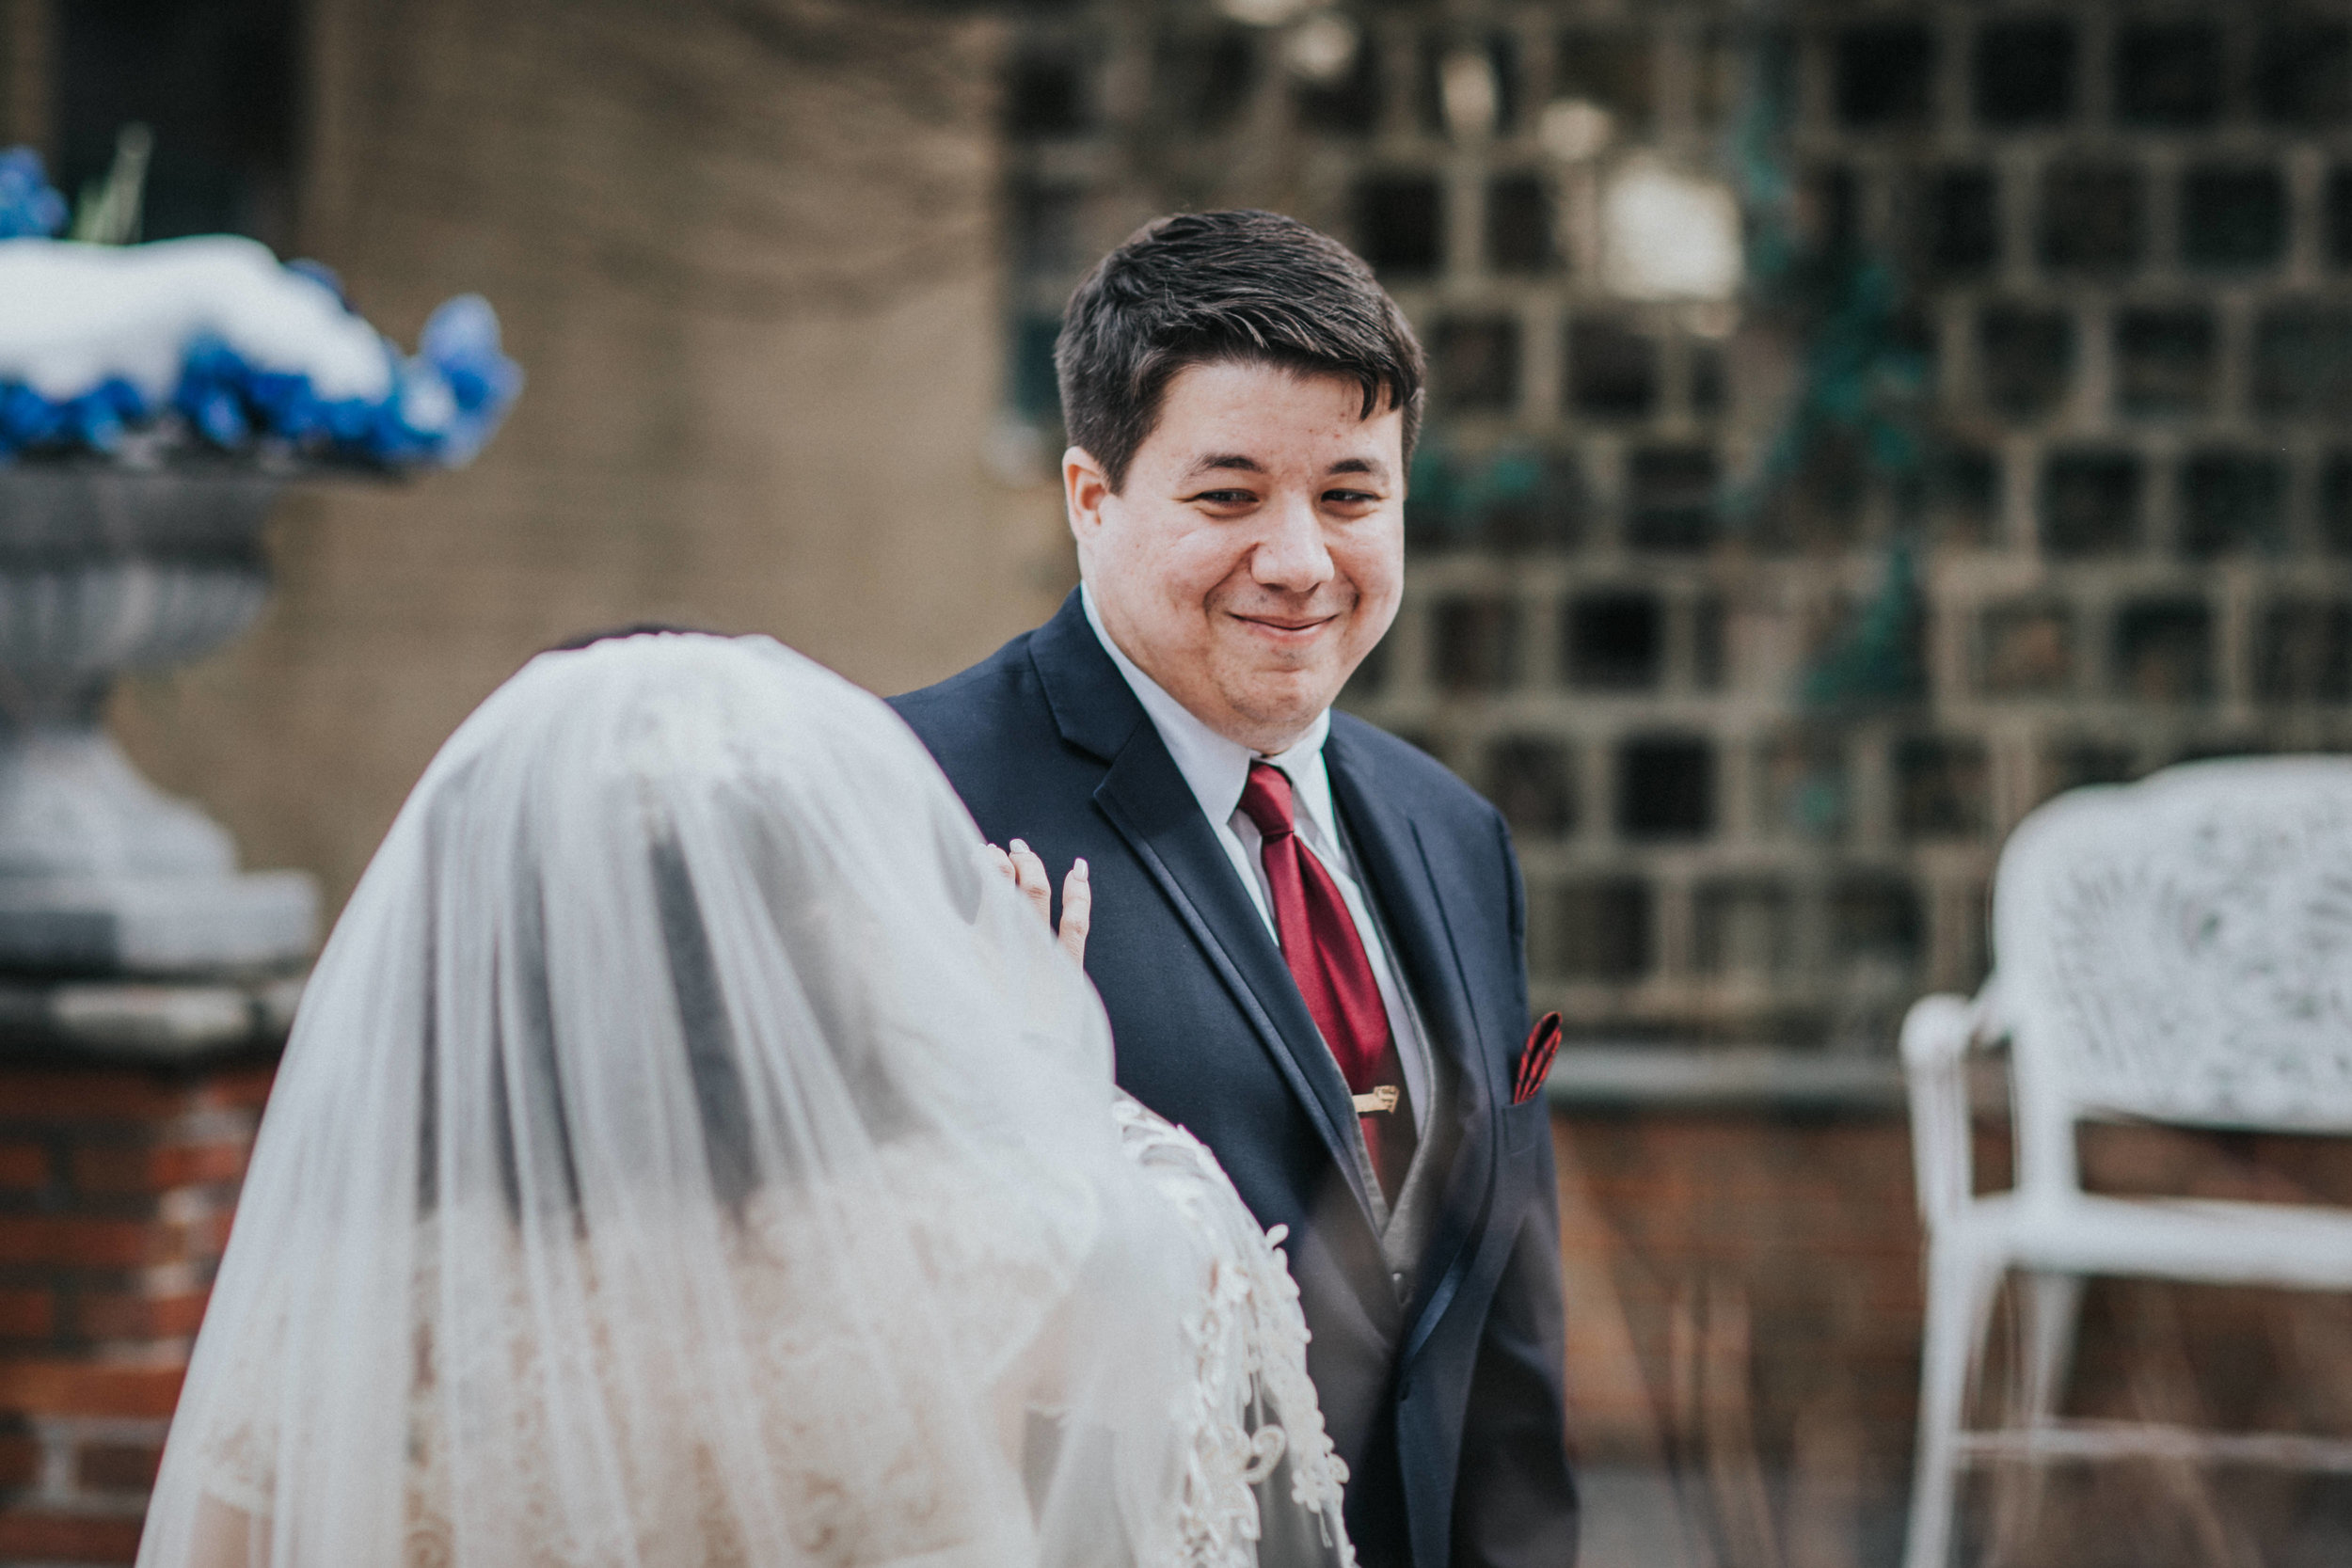 New-Jersey-Wedding-Photographer-ReceptionCenter-Valeria&Mike-First-Look-Bride&Groom (4 of 69).jpg